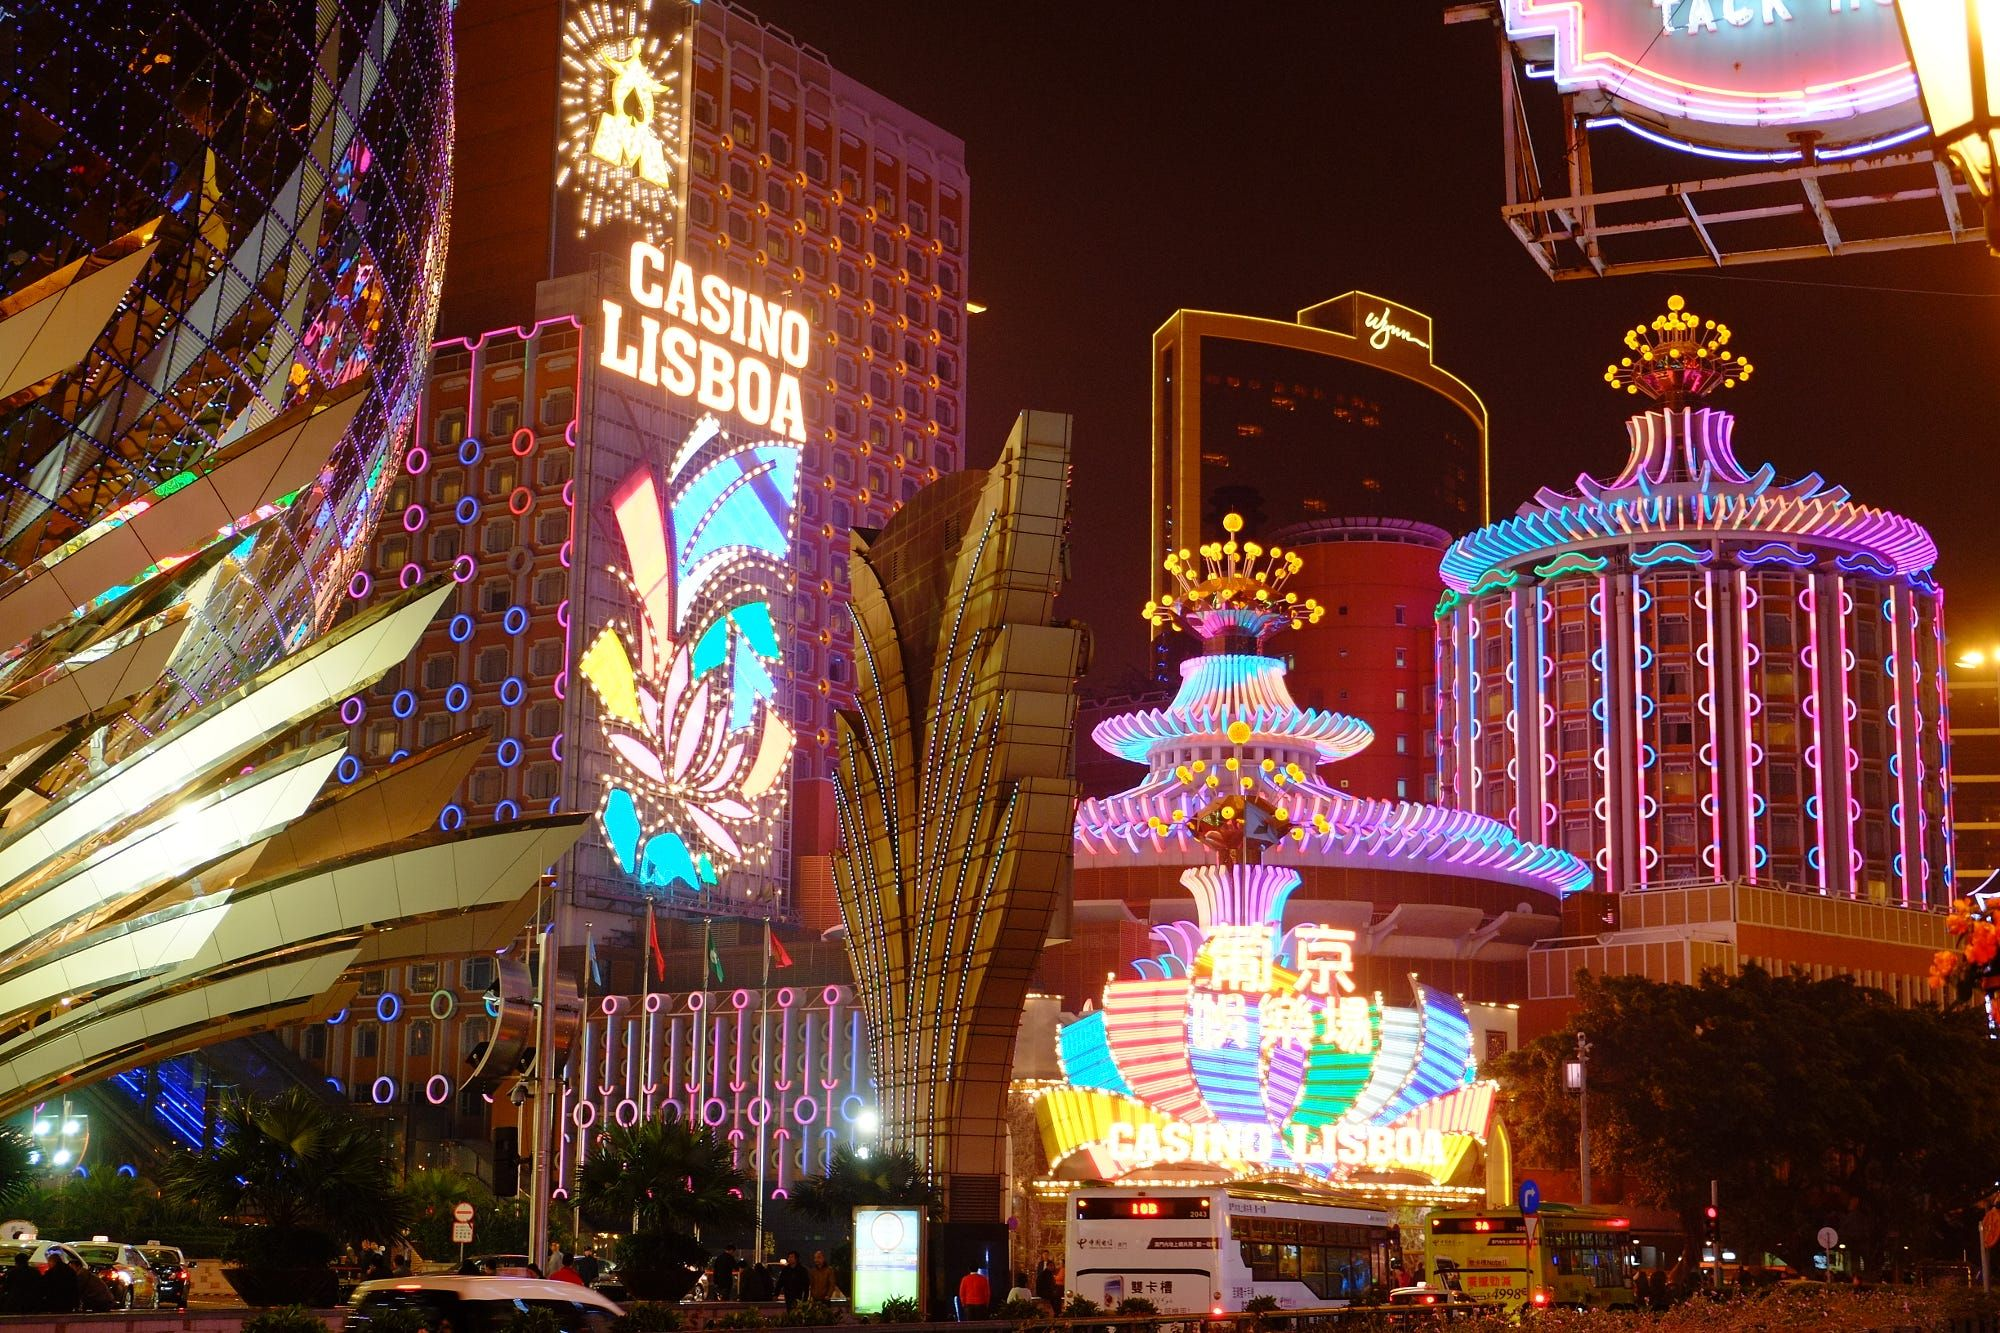 Macau underwater casino act enforcement gambling internet prohibition